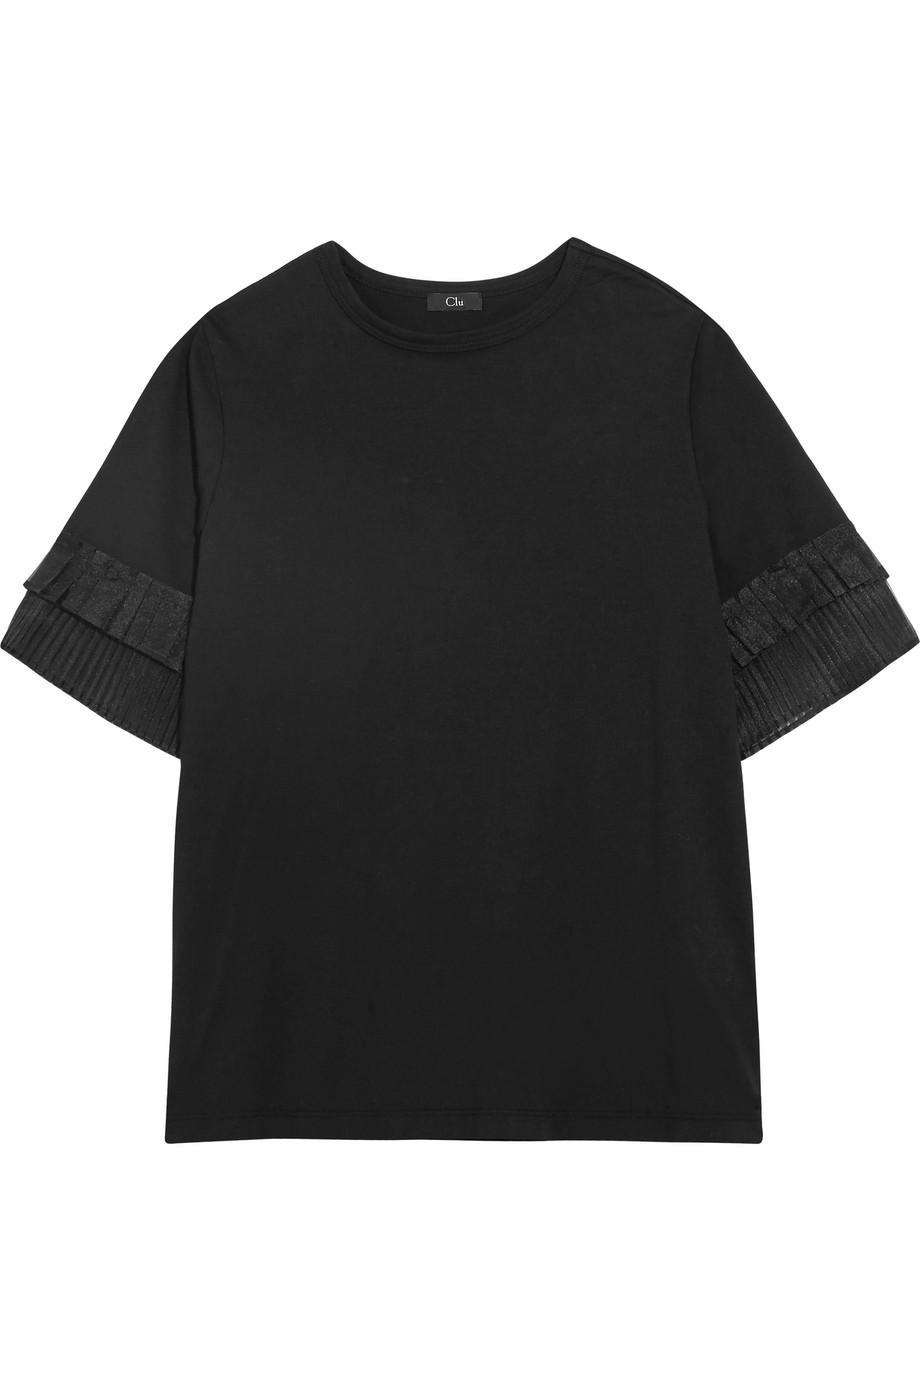 Pleated Organza-trimmed Silk-jersey T-shirt - Off-white Clu 2018 Online 2018 Unisex Cheap Online Shop Offer For Sale Cheap Newest dnllVzg3